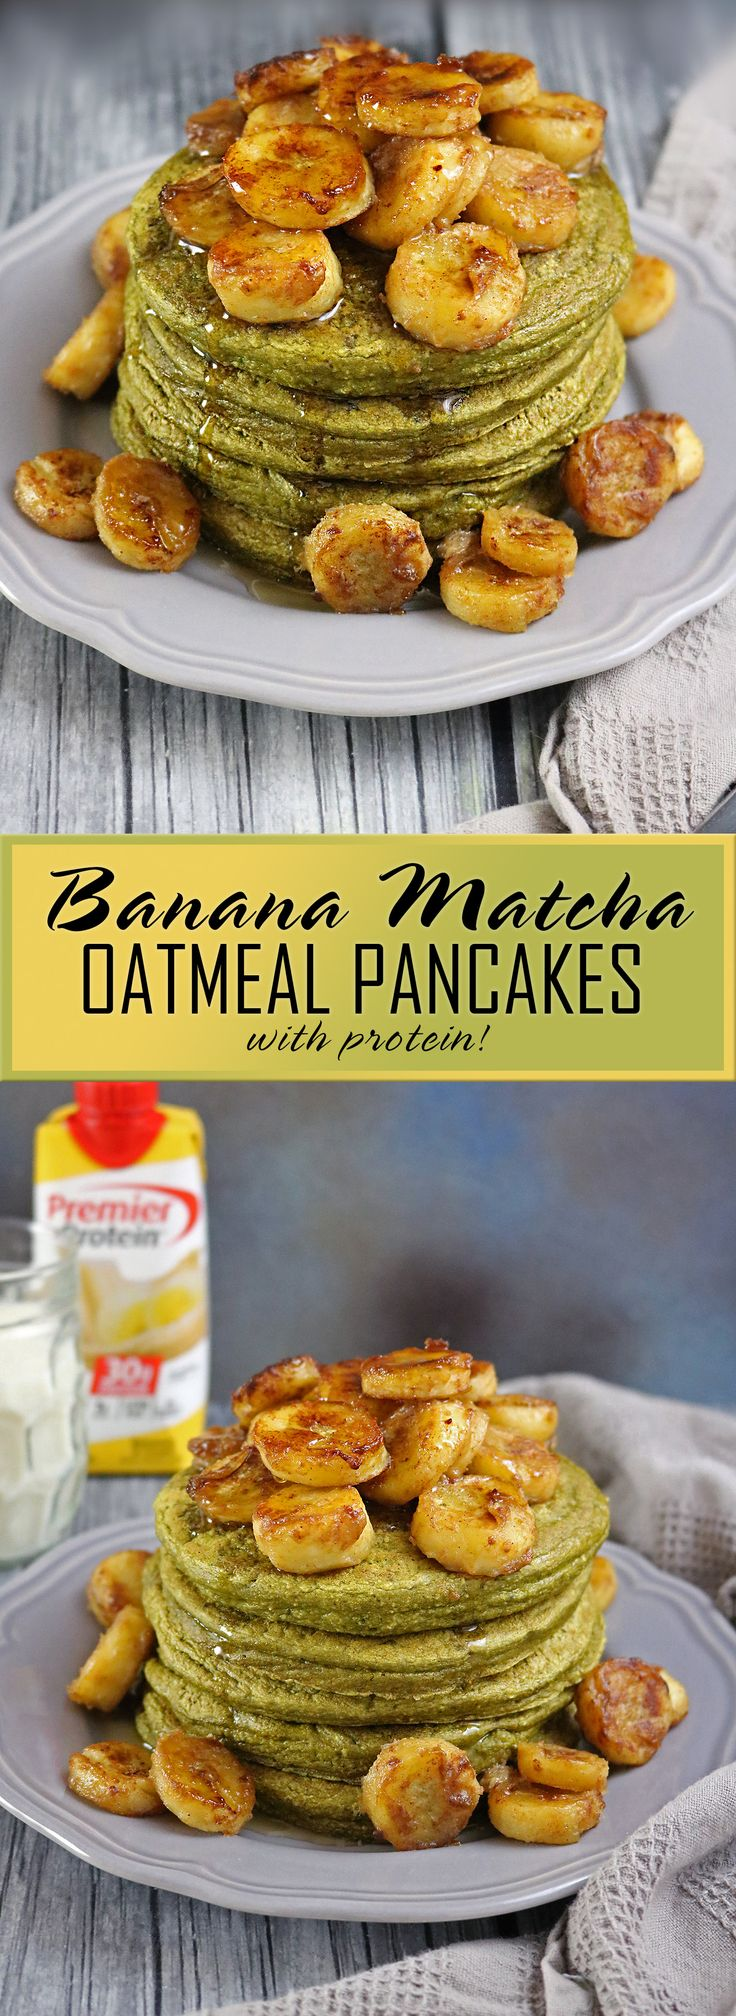 Banana Matcha Oatmeal Pancakes with Cinnamon Cream Bananas #TheDayIsYours #sponsored @PremierProtein